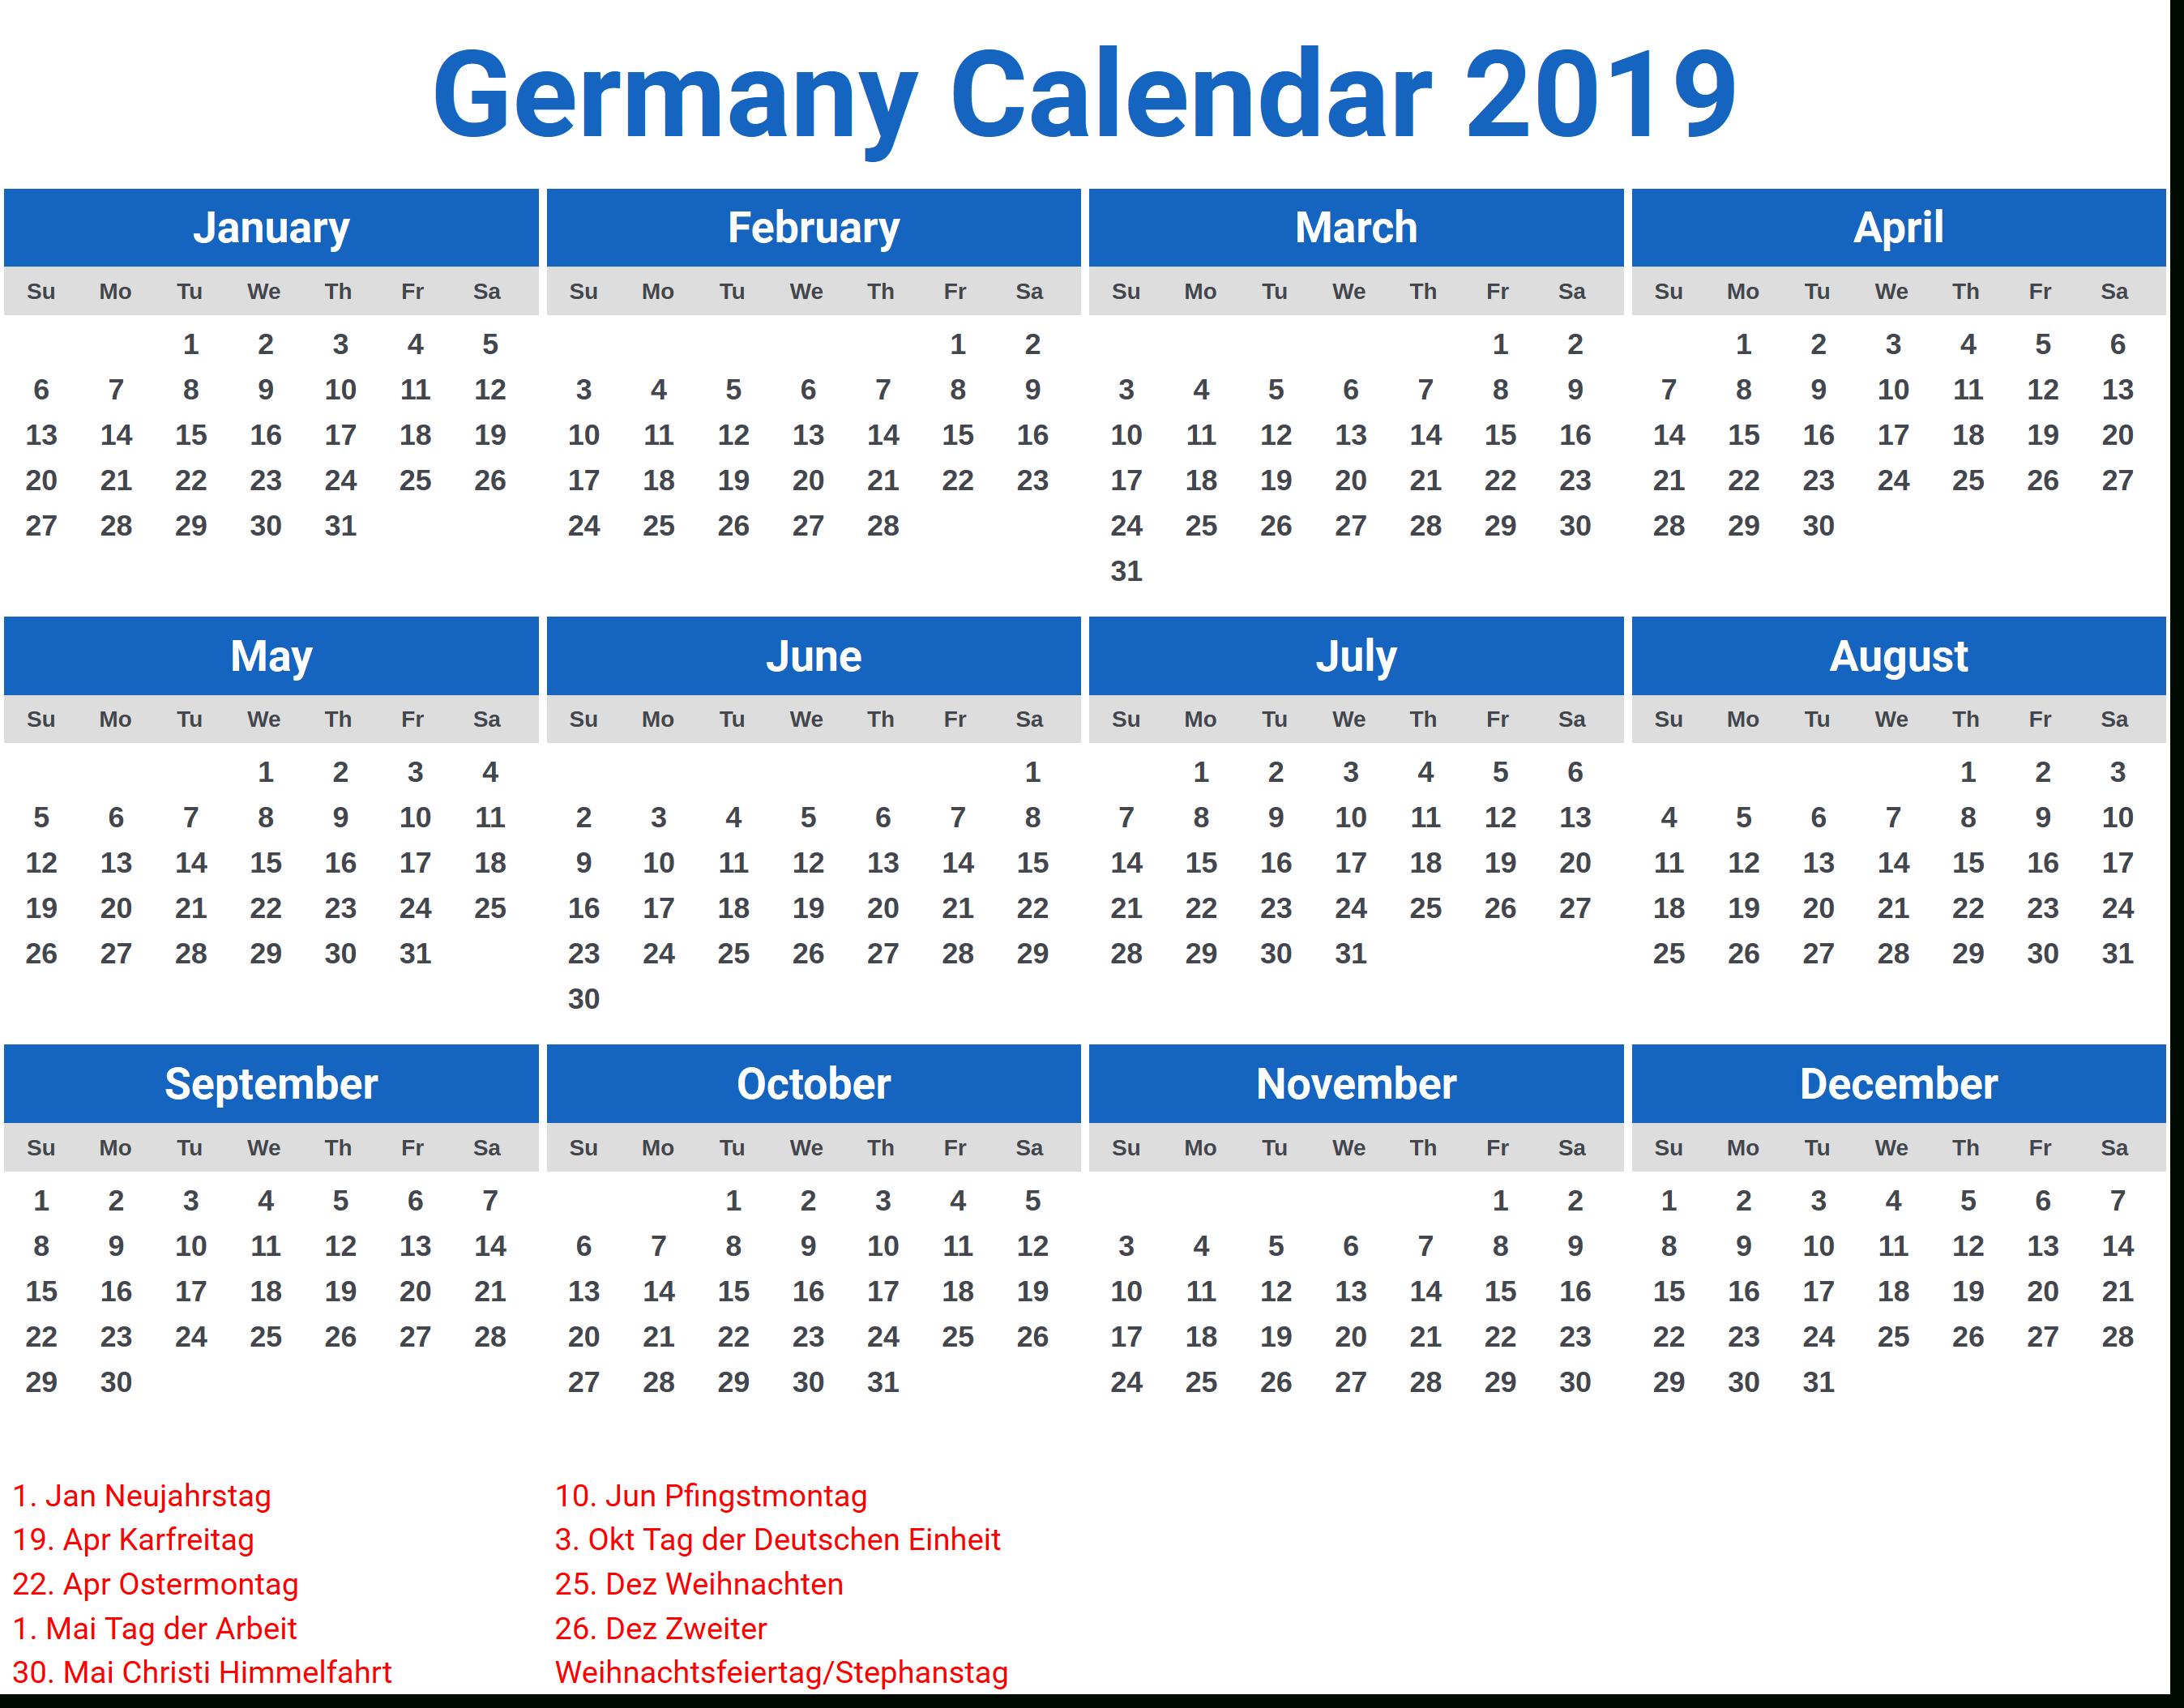 Germany 2019 Calendar With Holidays | 2019 Calendar